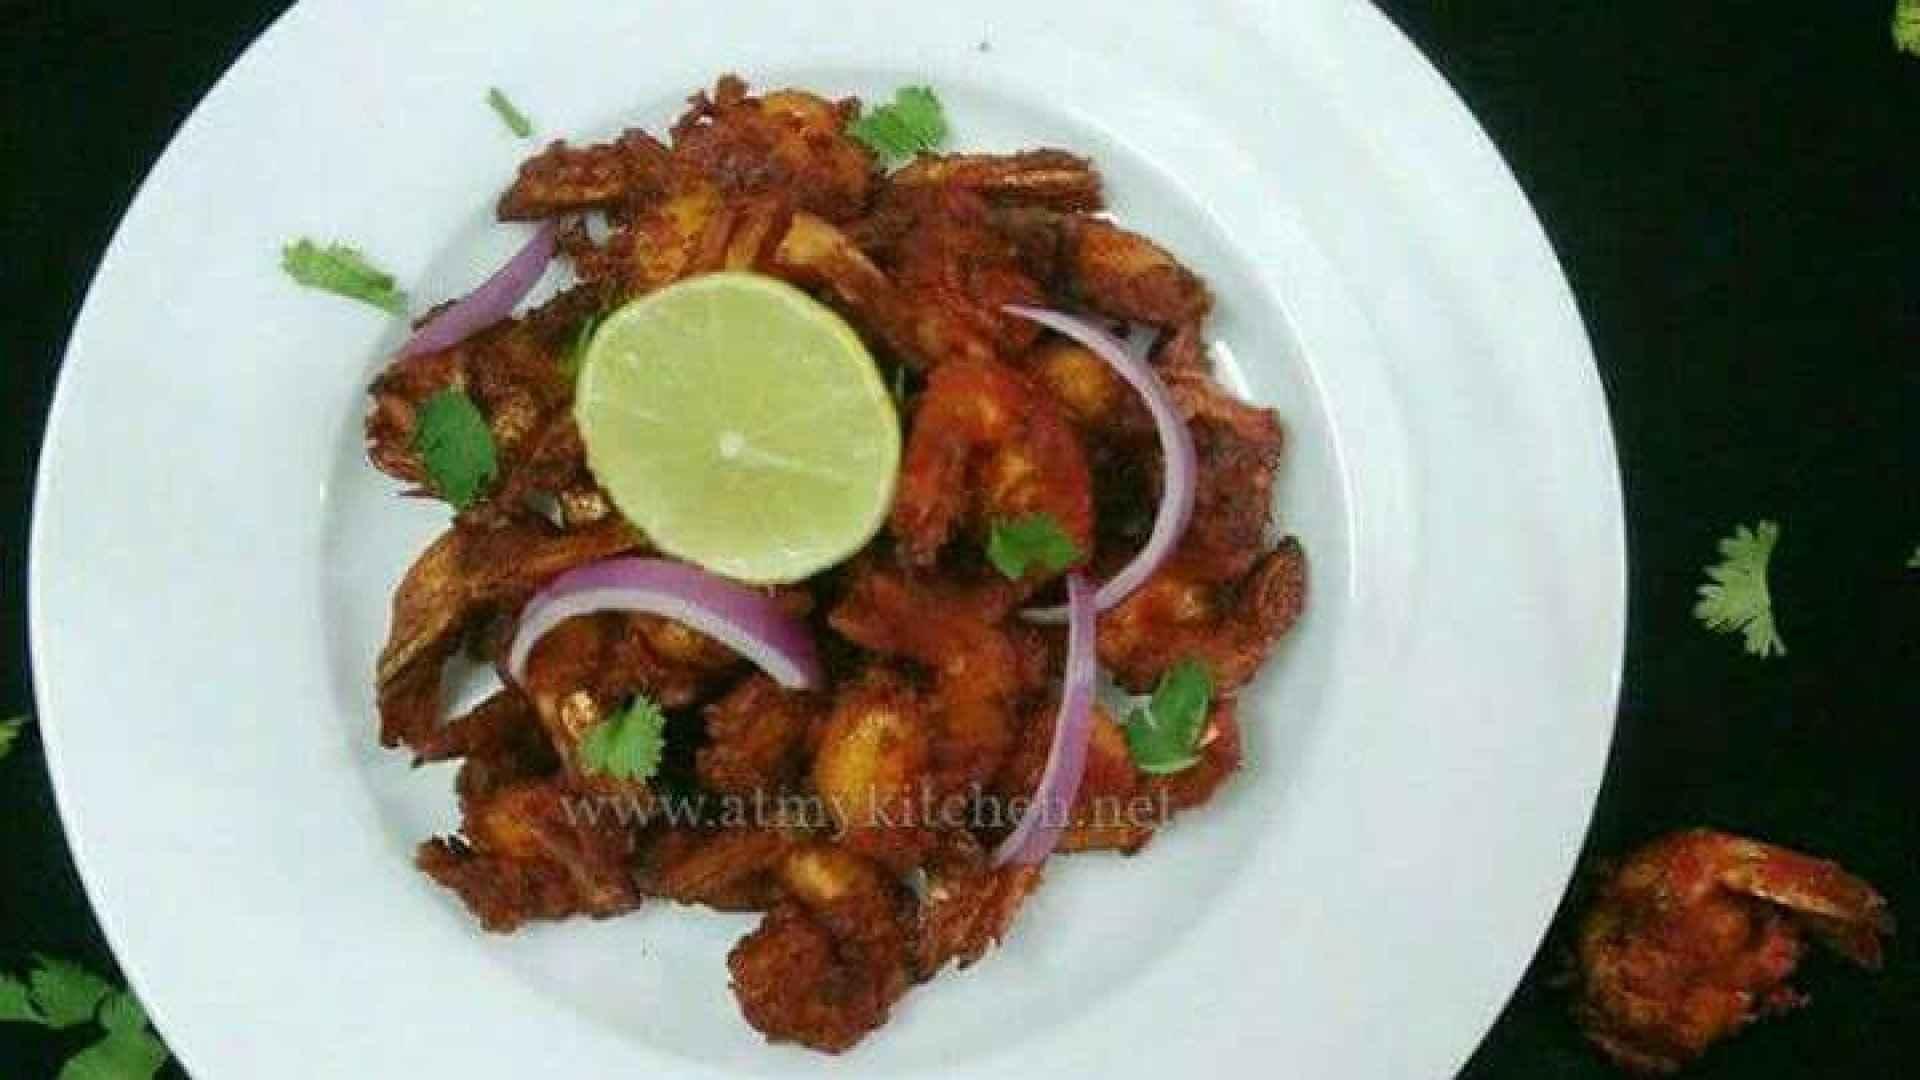 Prawn 65 recipe/ Shrimp recipe